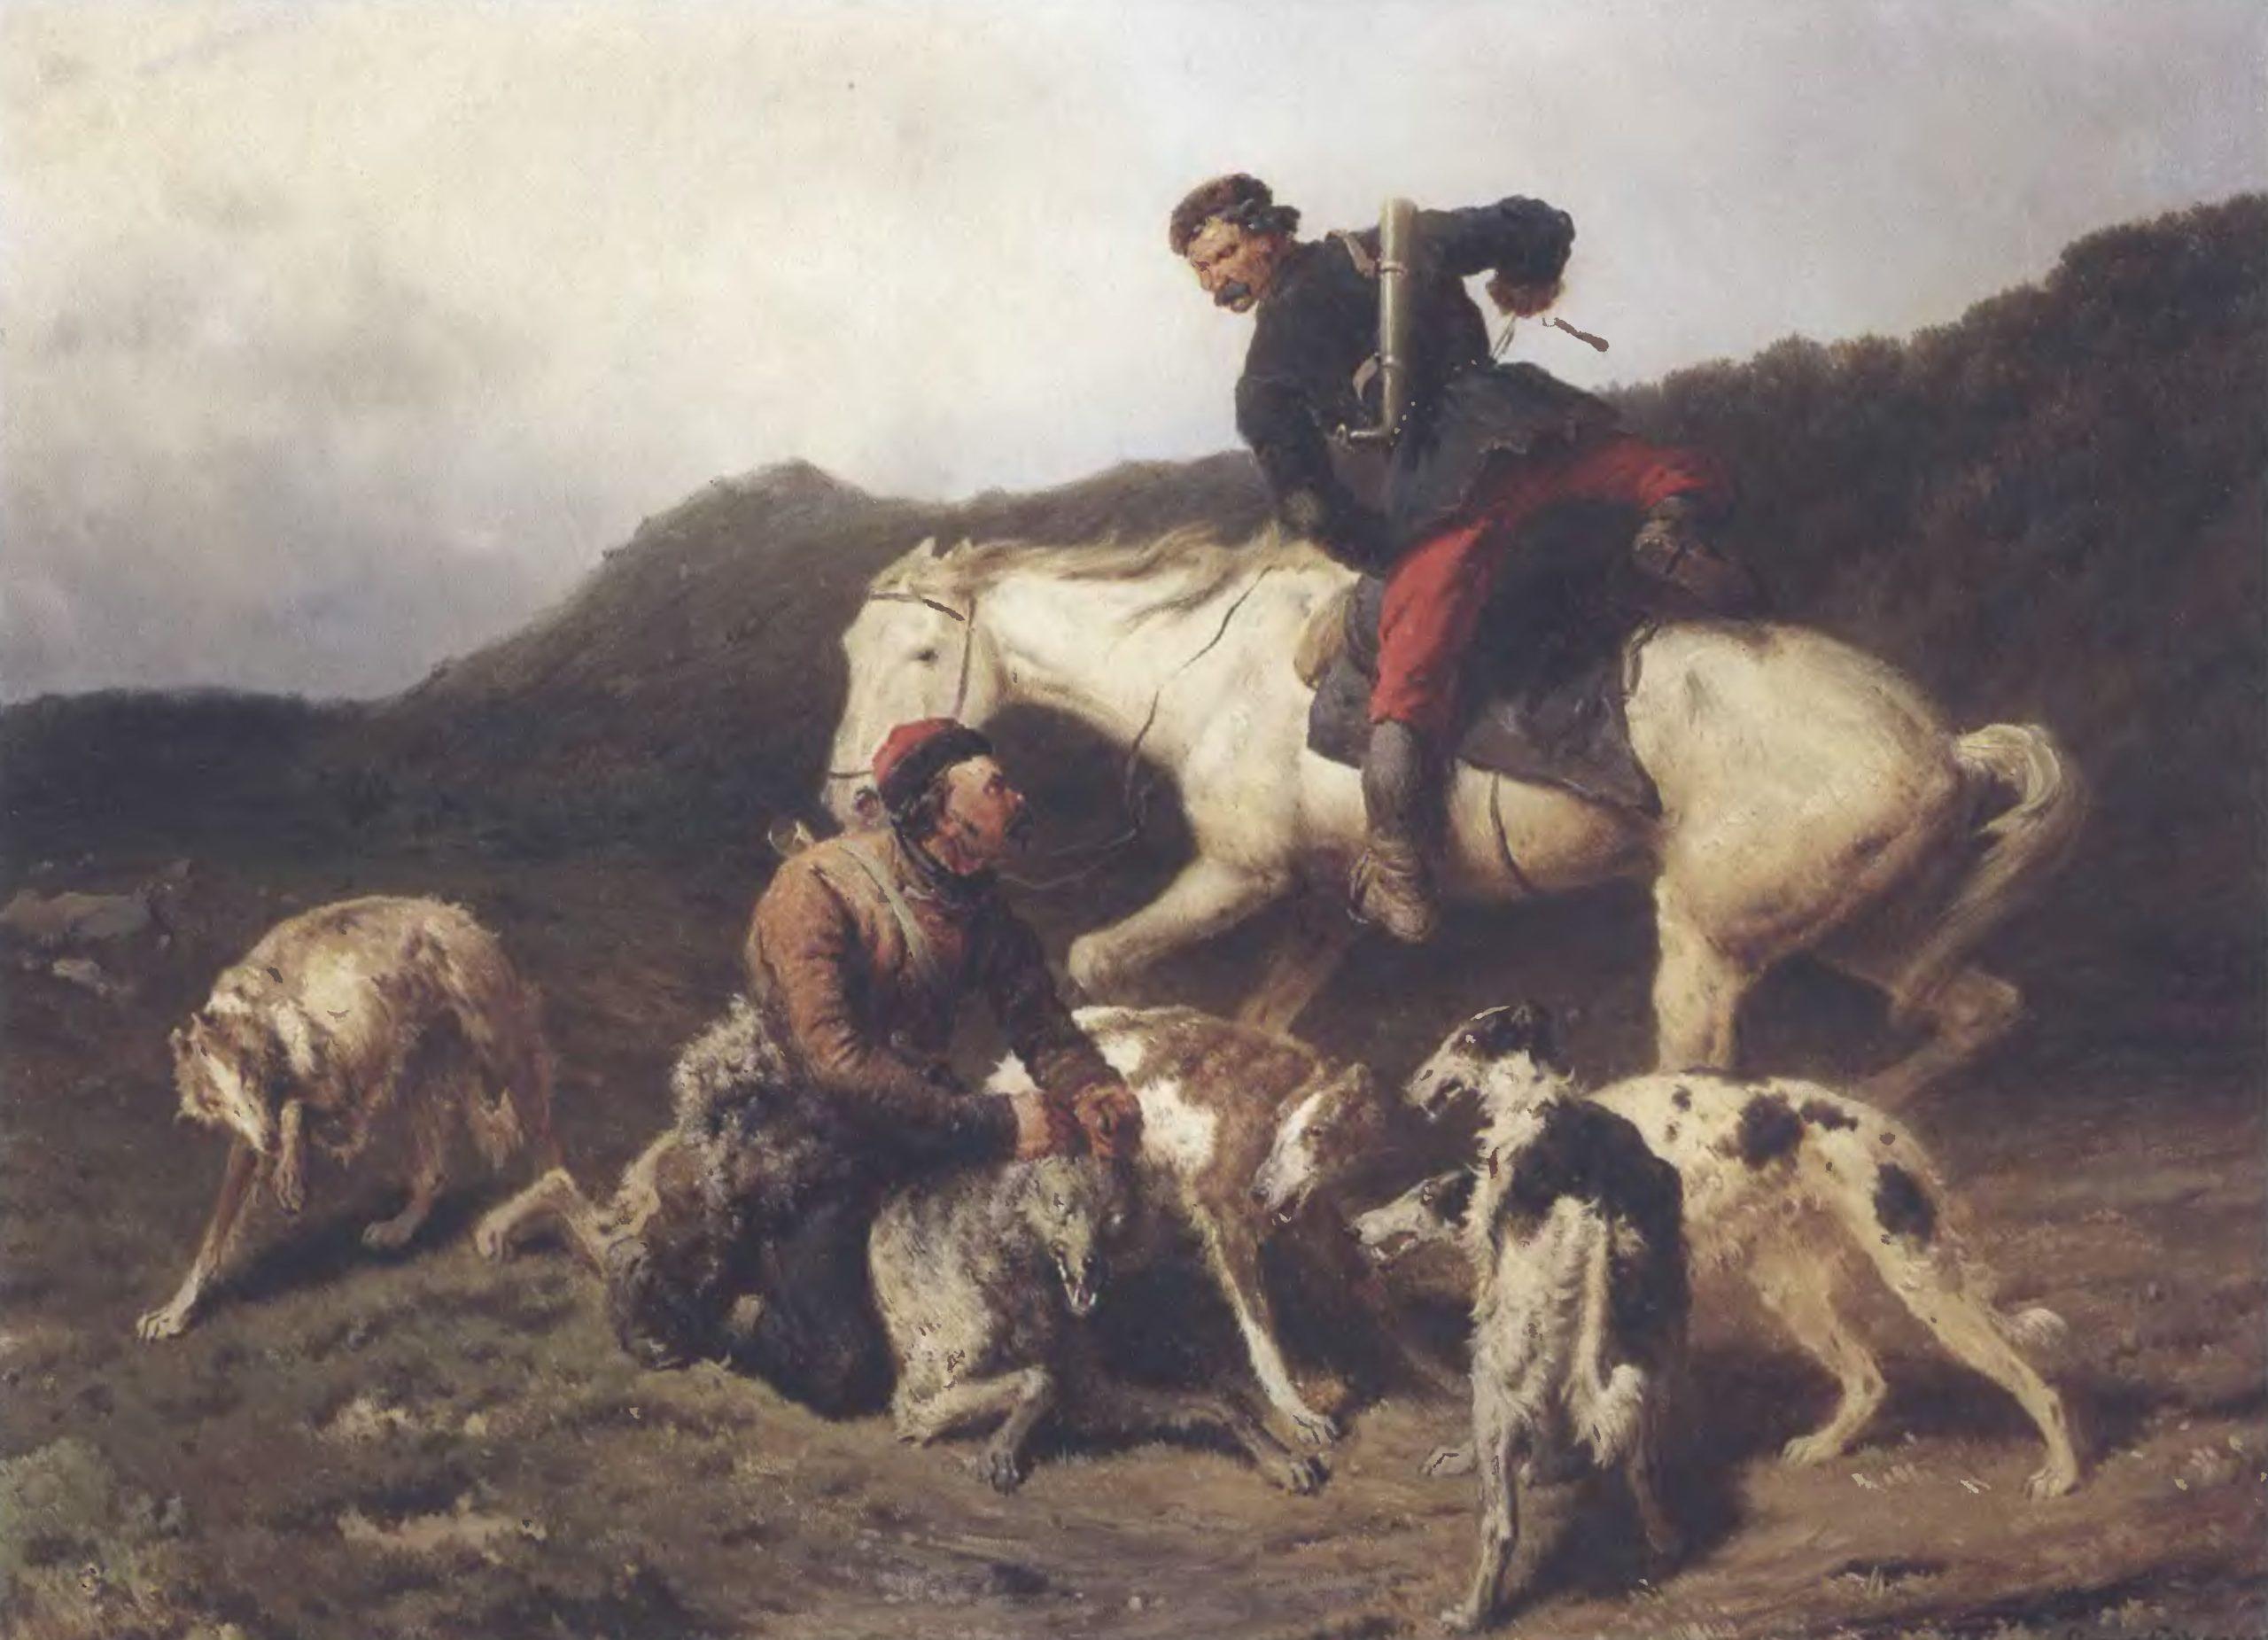 ПЕТР СОКОЛОВ. Охота на волка. 1873. Холст, масло. 70 х 91,8 см. Государственная Третьяковская галерея